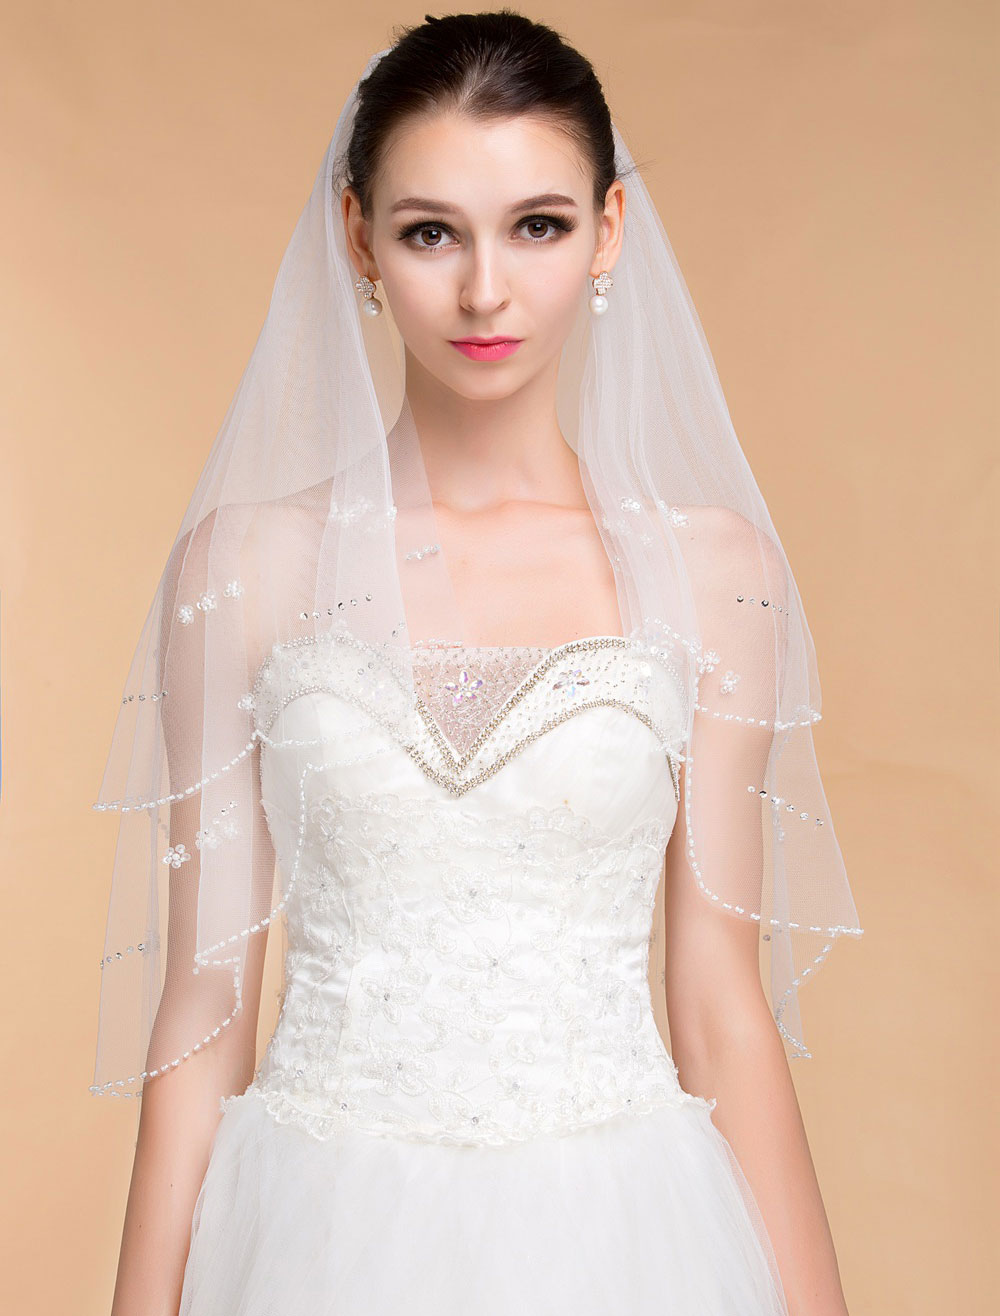 Bridal Wedding Veil With Beaded Edge